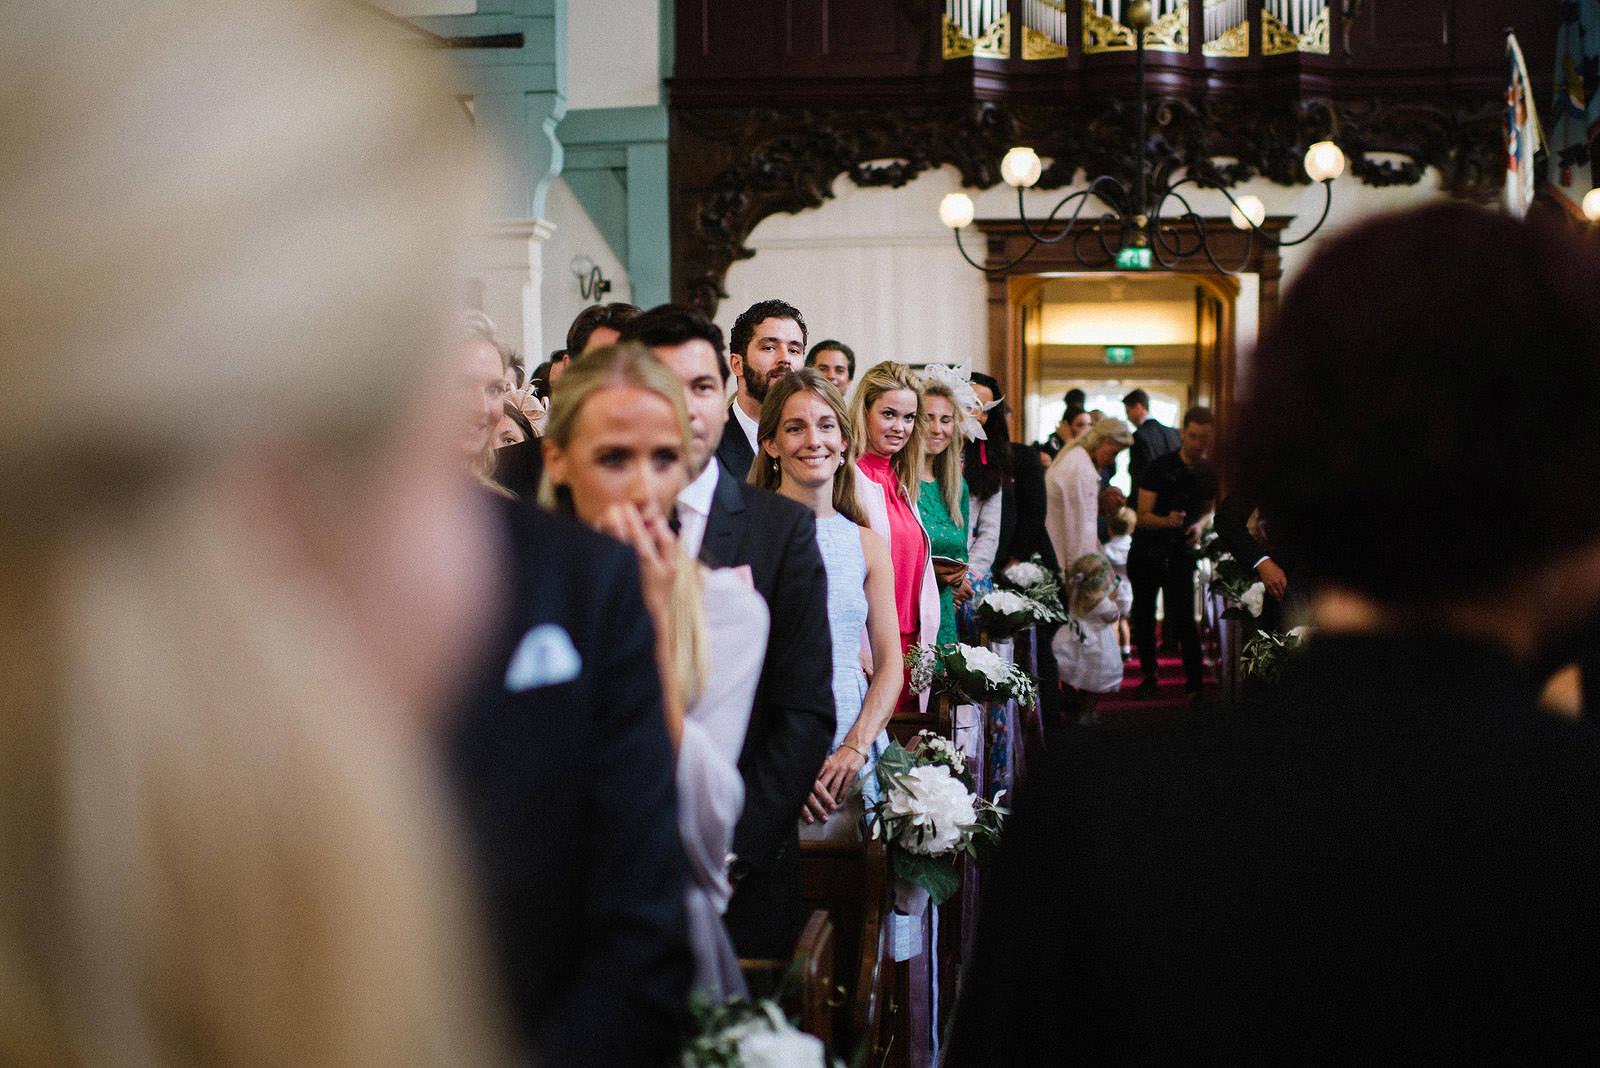 Fotograf Konstanz - Destination Wedding Photographer Amsterdam 041 - Destination Wedding Amsterdam  - 150 -